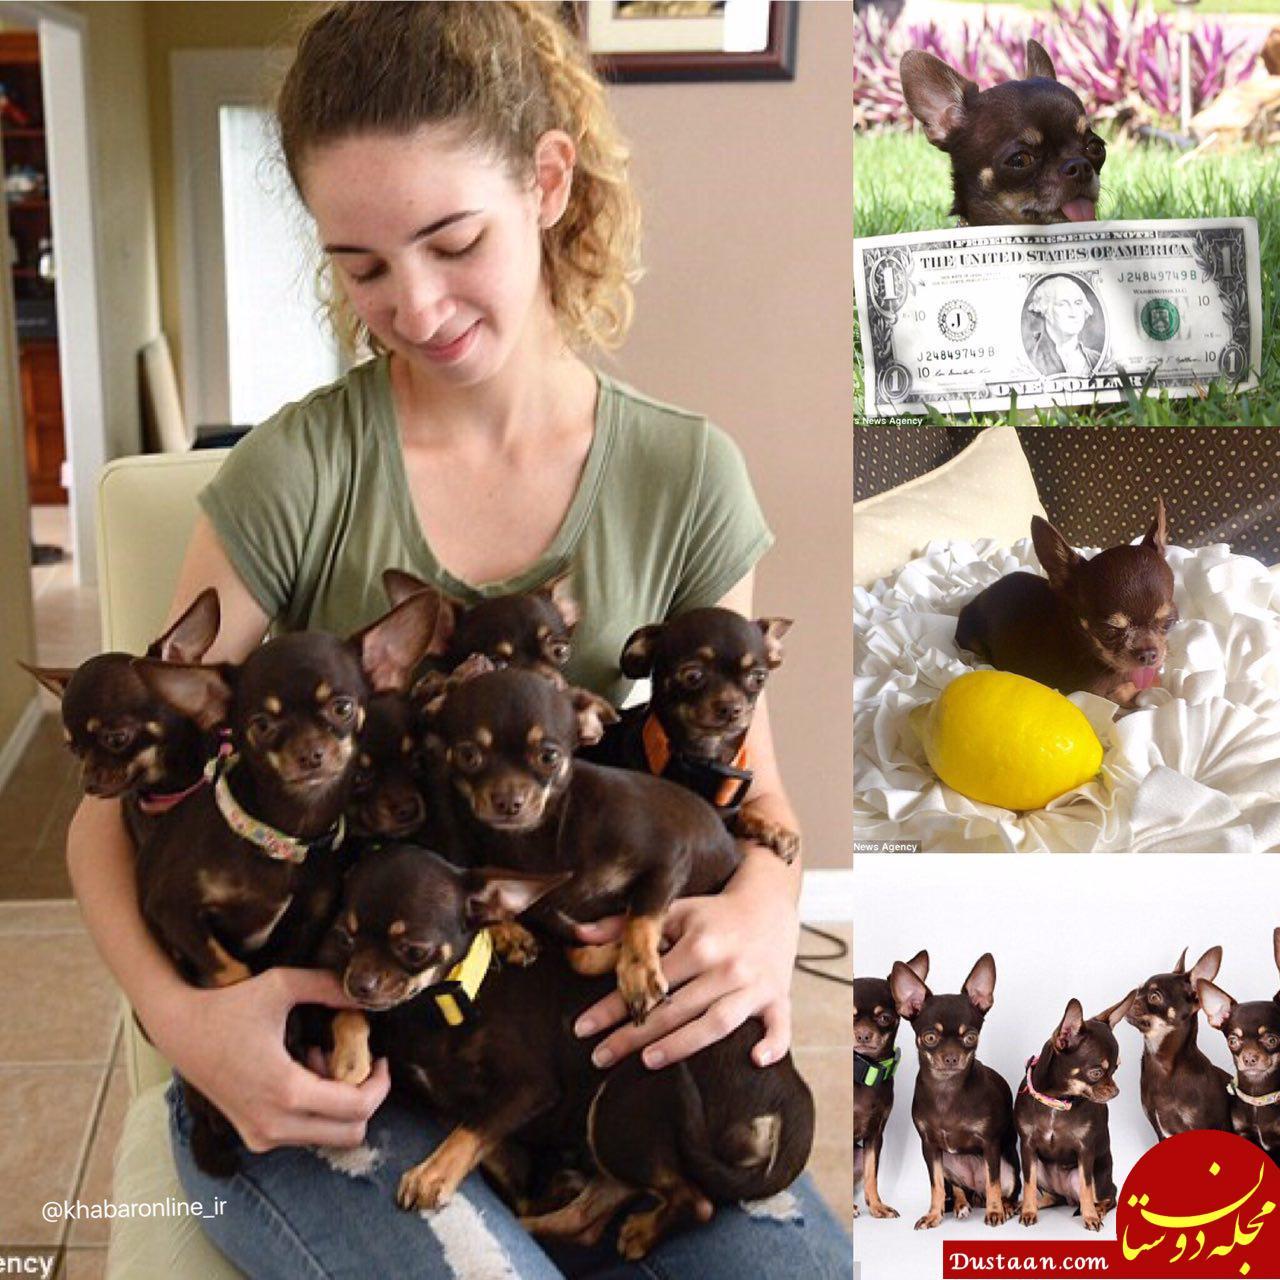 www.dustaan.com کوچک ترین سگ دنیا با 10 سانتی متر قد! +عکس